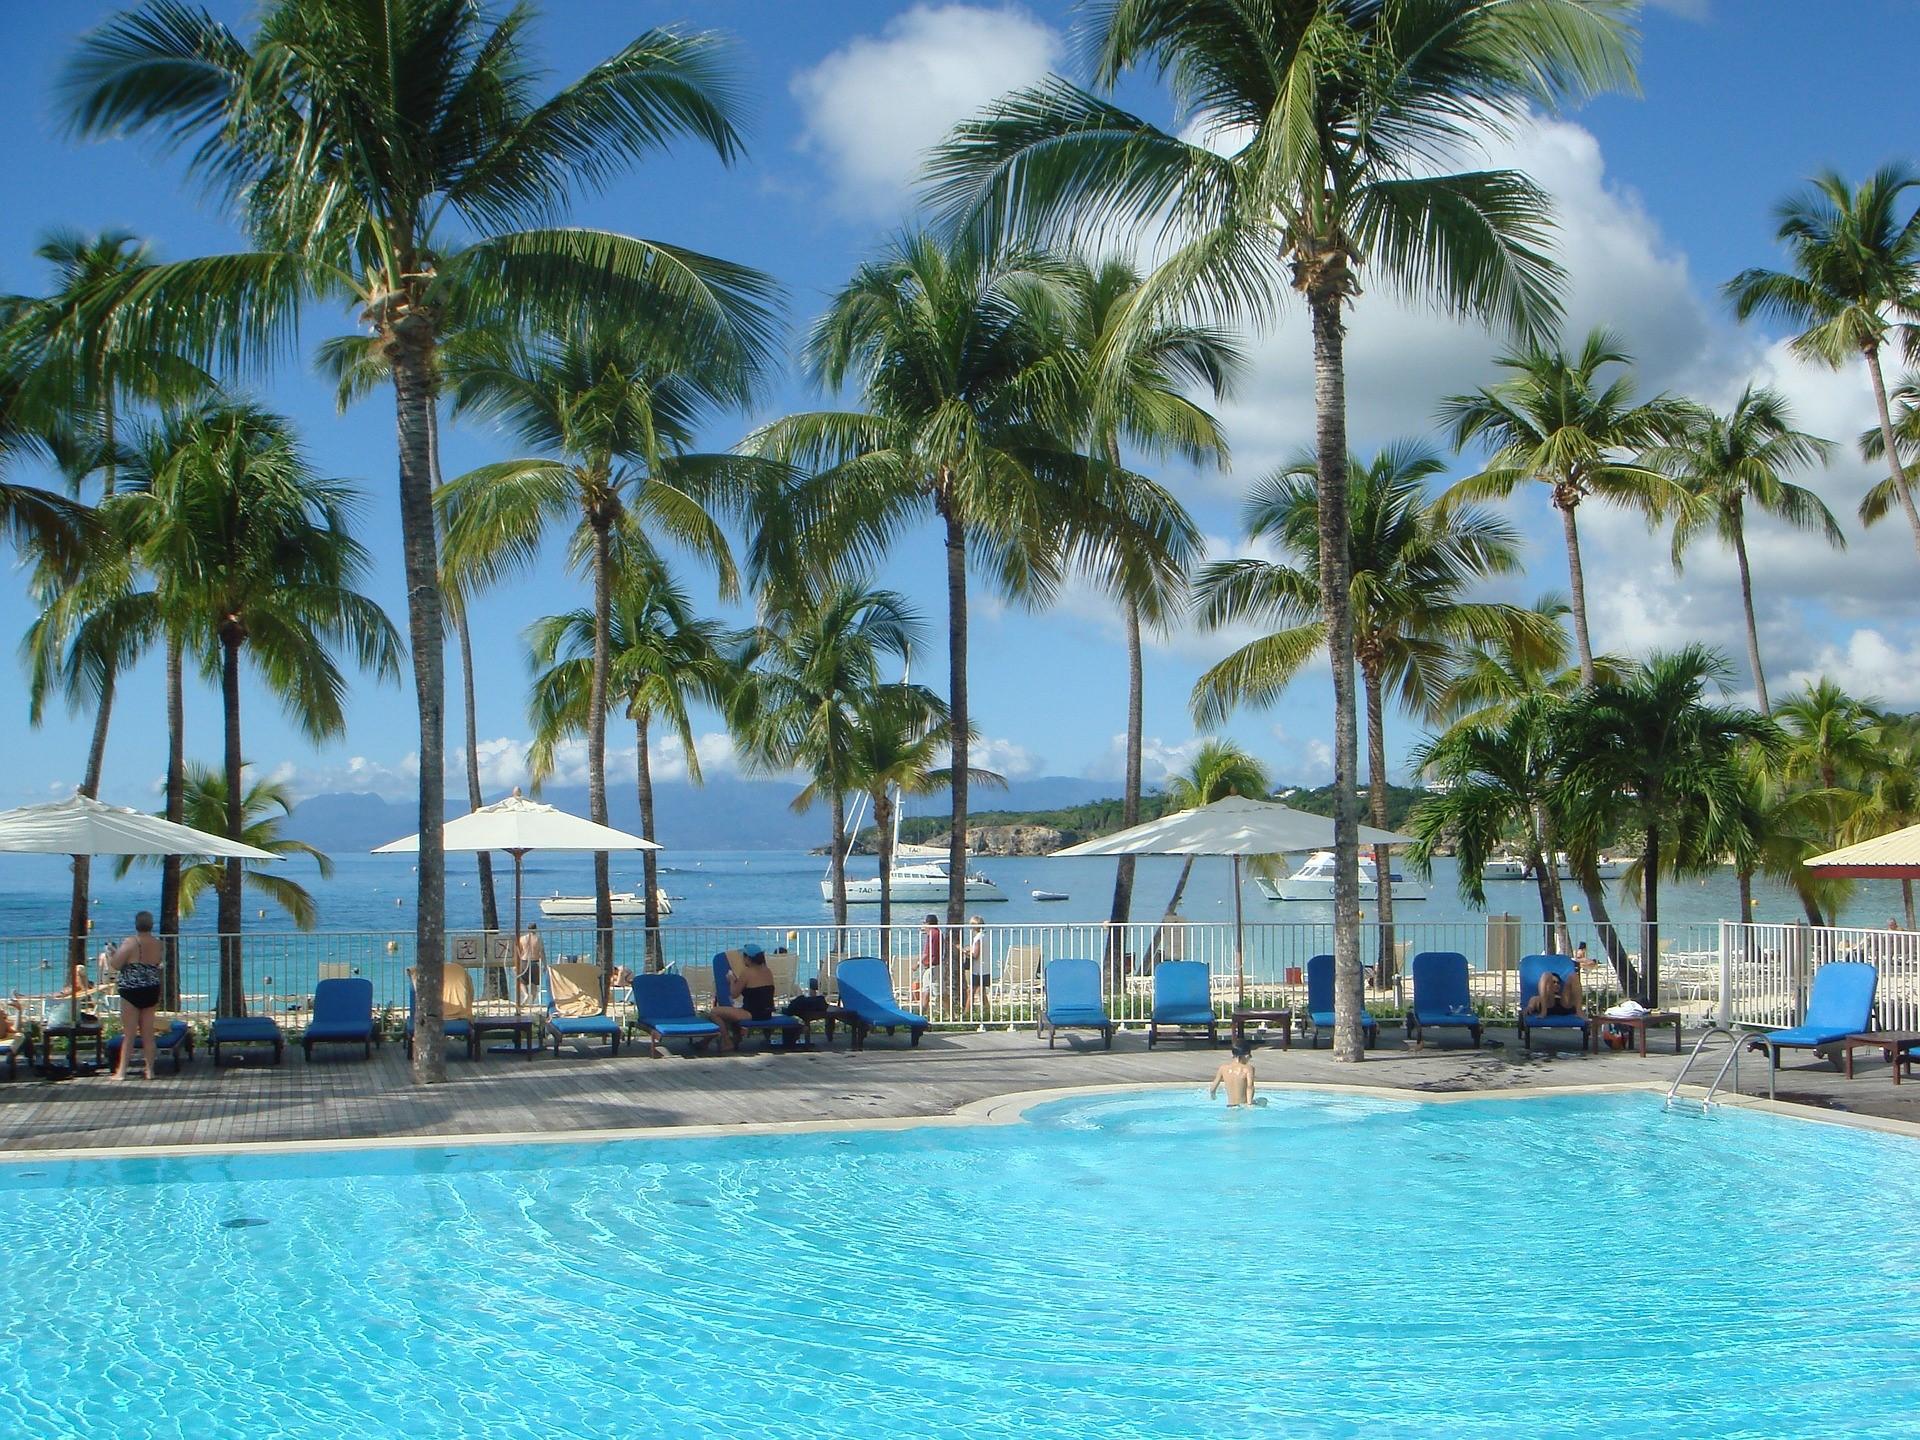 Retaprene impermeabilizante para piscina - Impermeabilizantes para piscinas ...